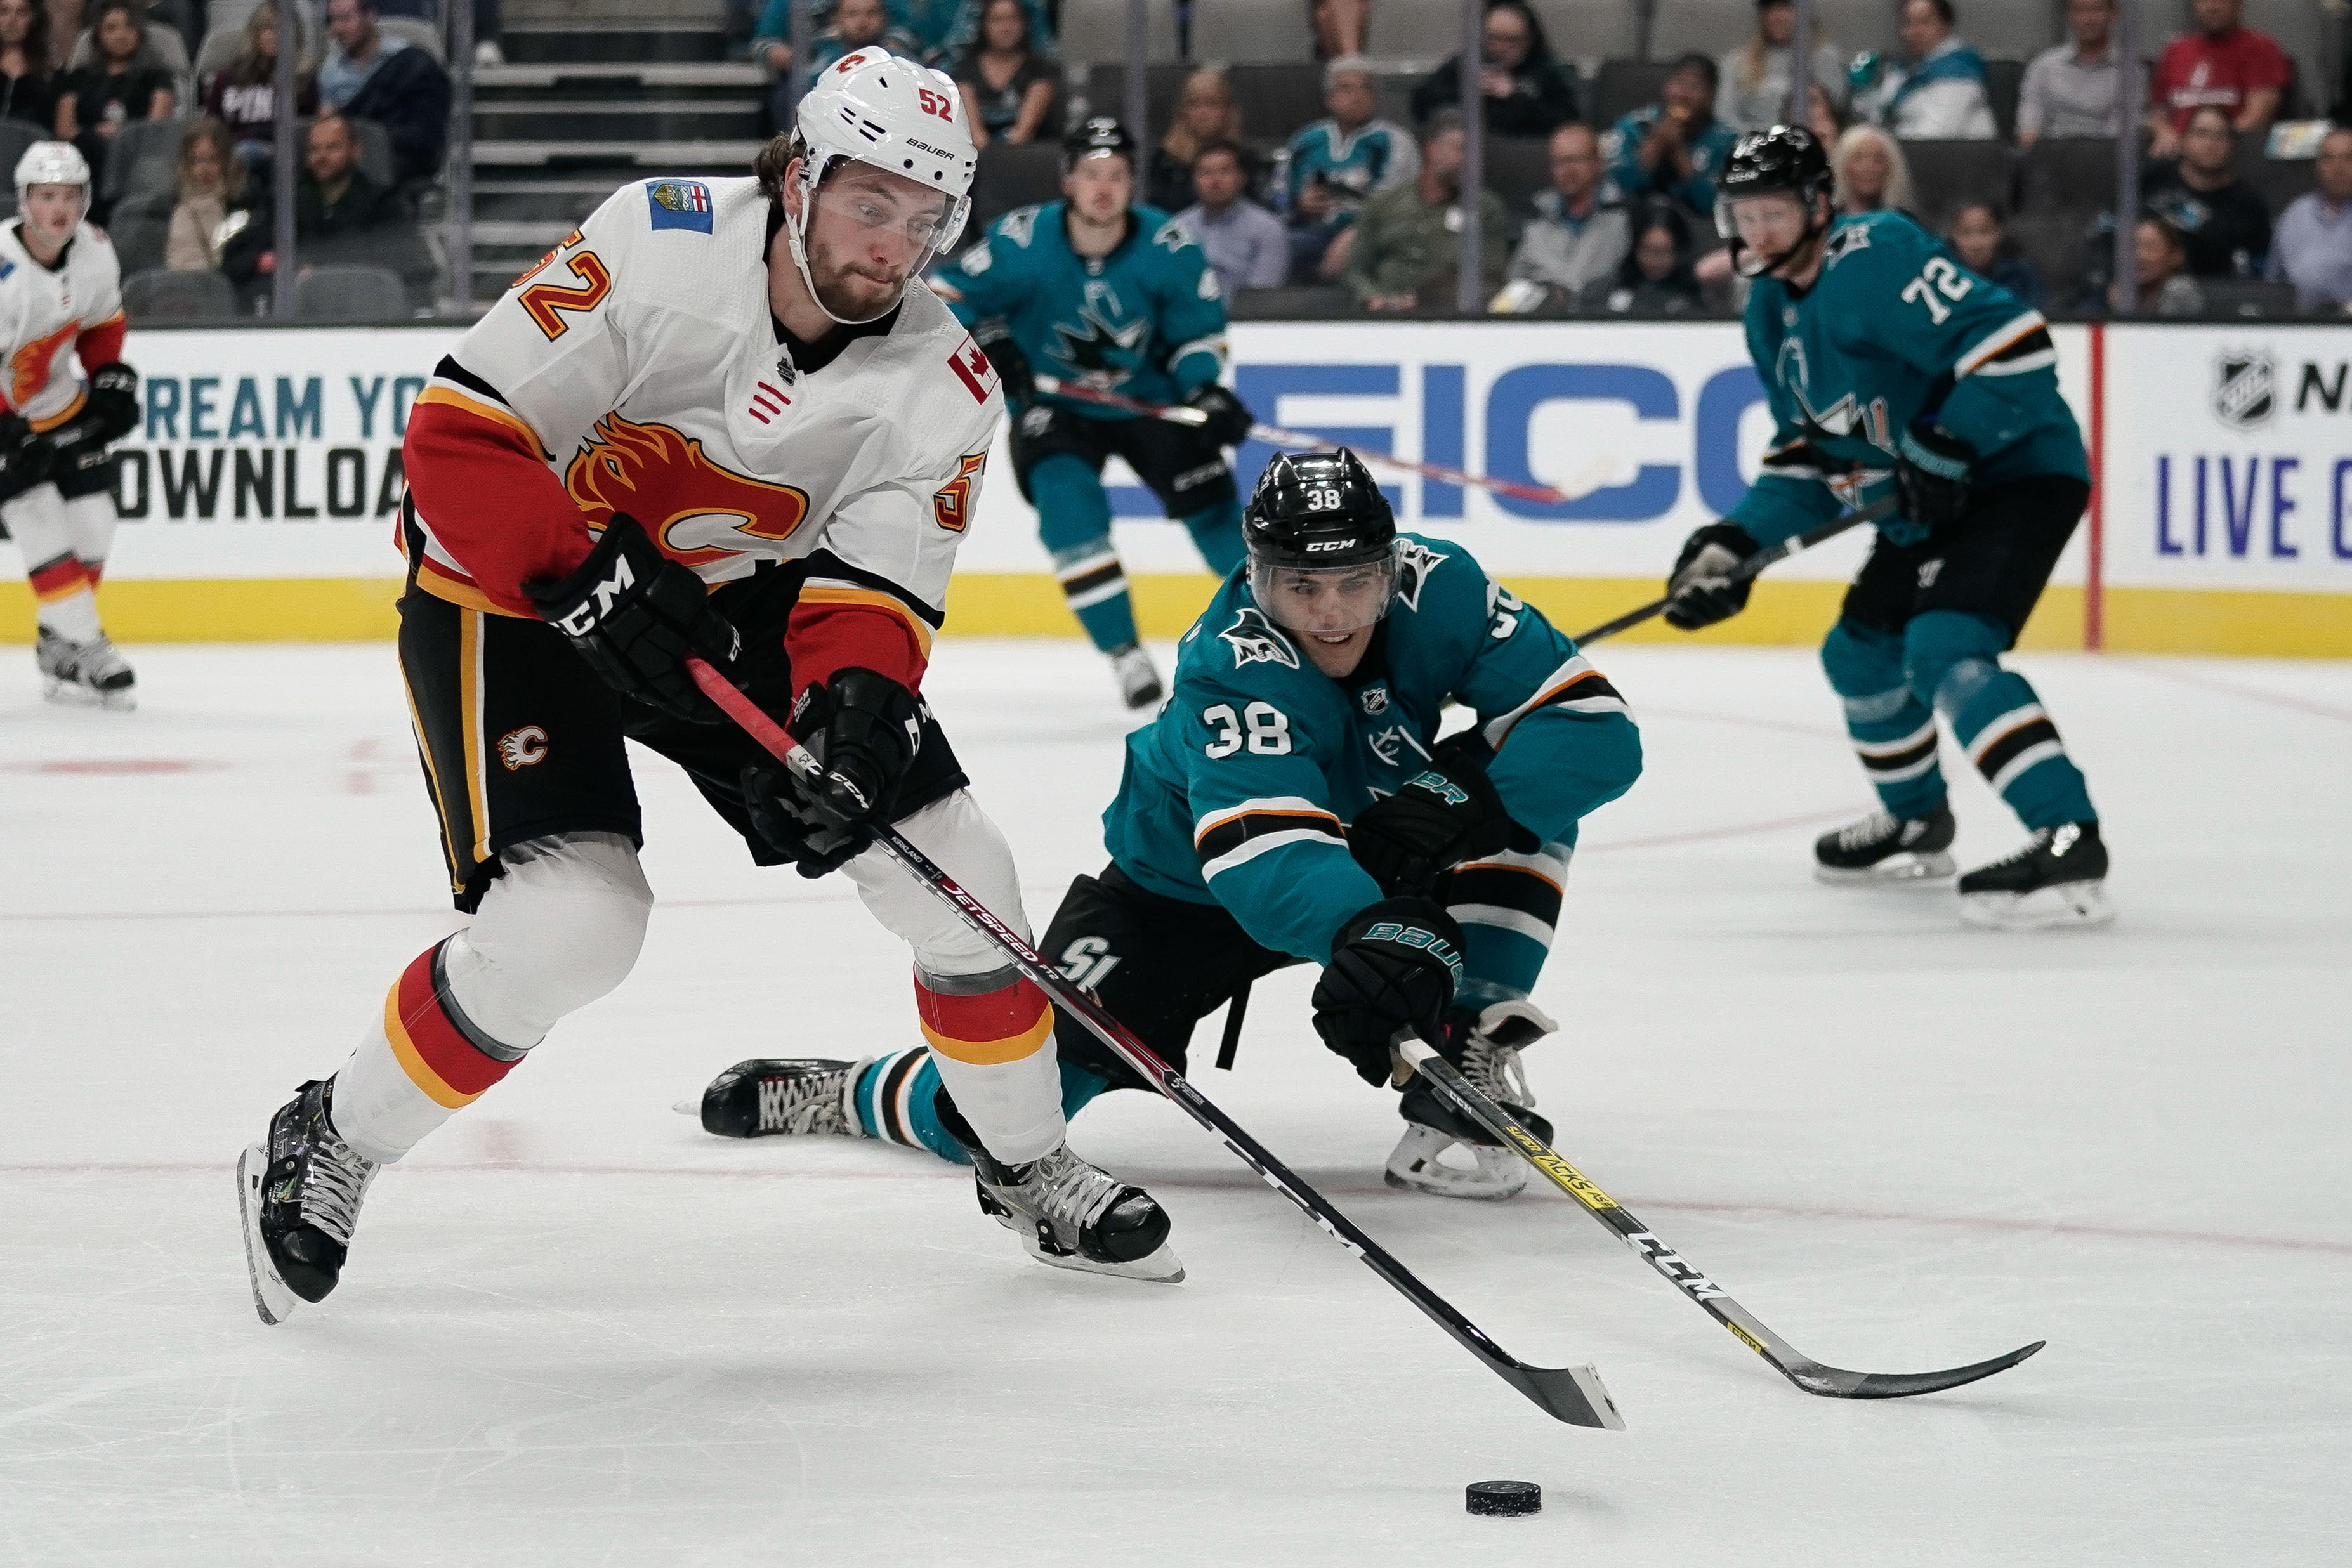 Sep 26, 2019; San Jose, CA, USA; San Jose Sharks defenseman Mario Ferraro (38) defends against Calgary Flames left wing Justin Kirkland (52) during the first period at the SAP Center at San Jose. Mandatory Credit: Stan Szeto